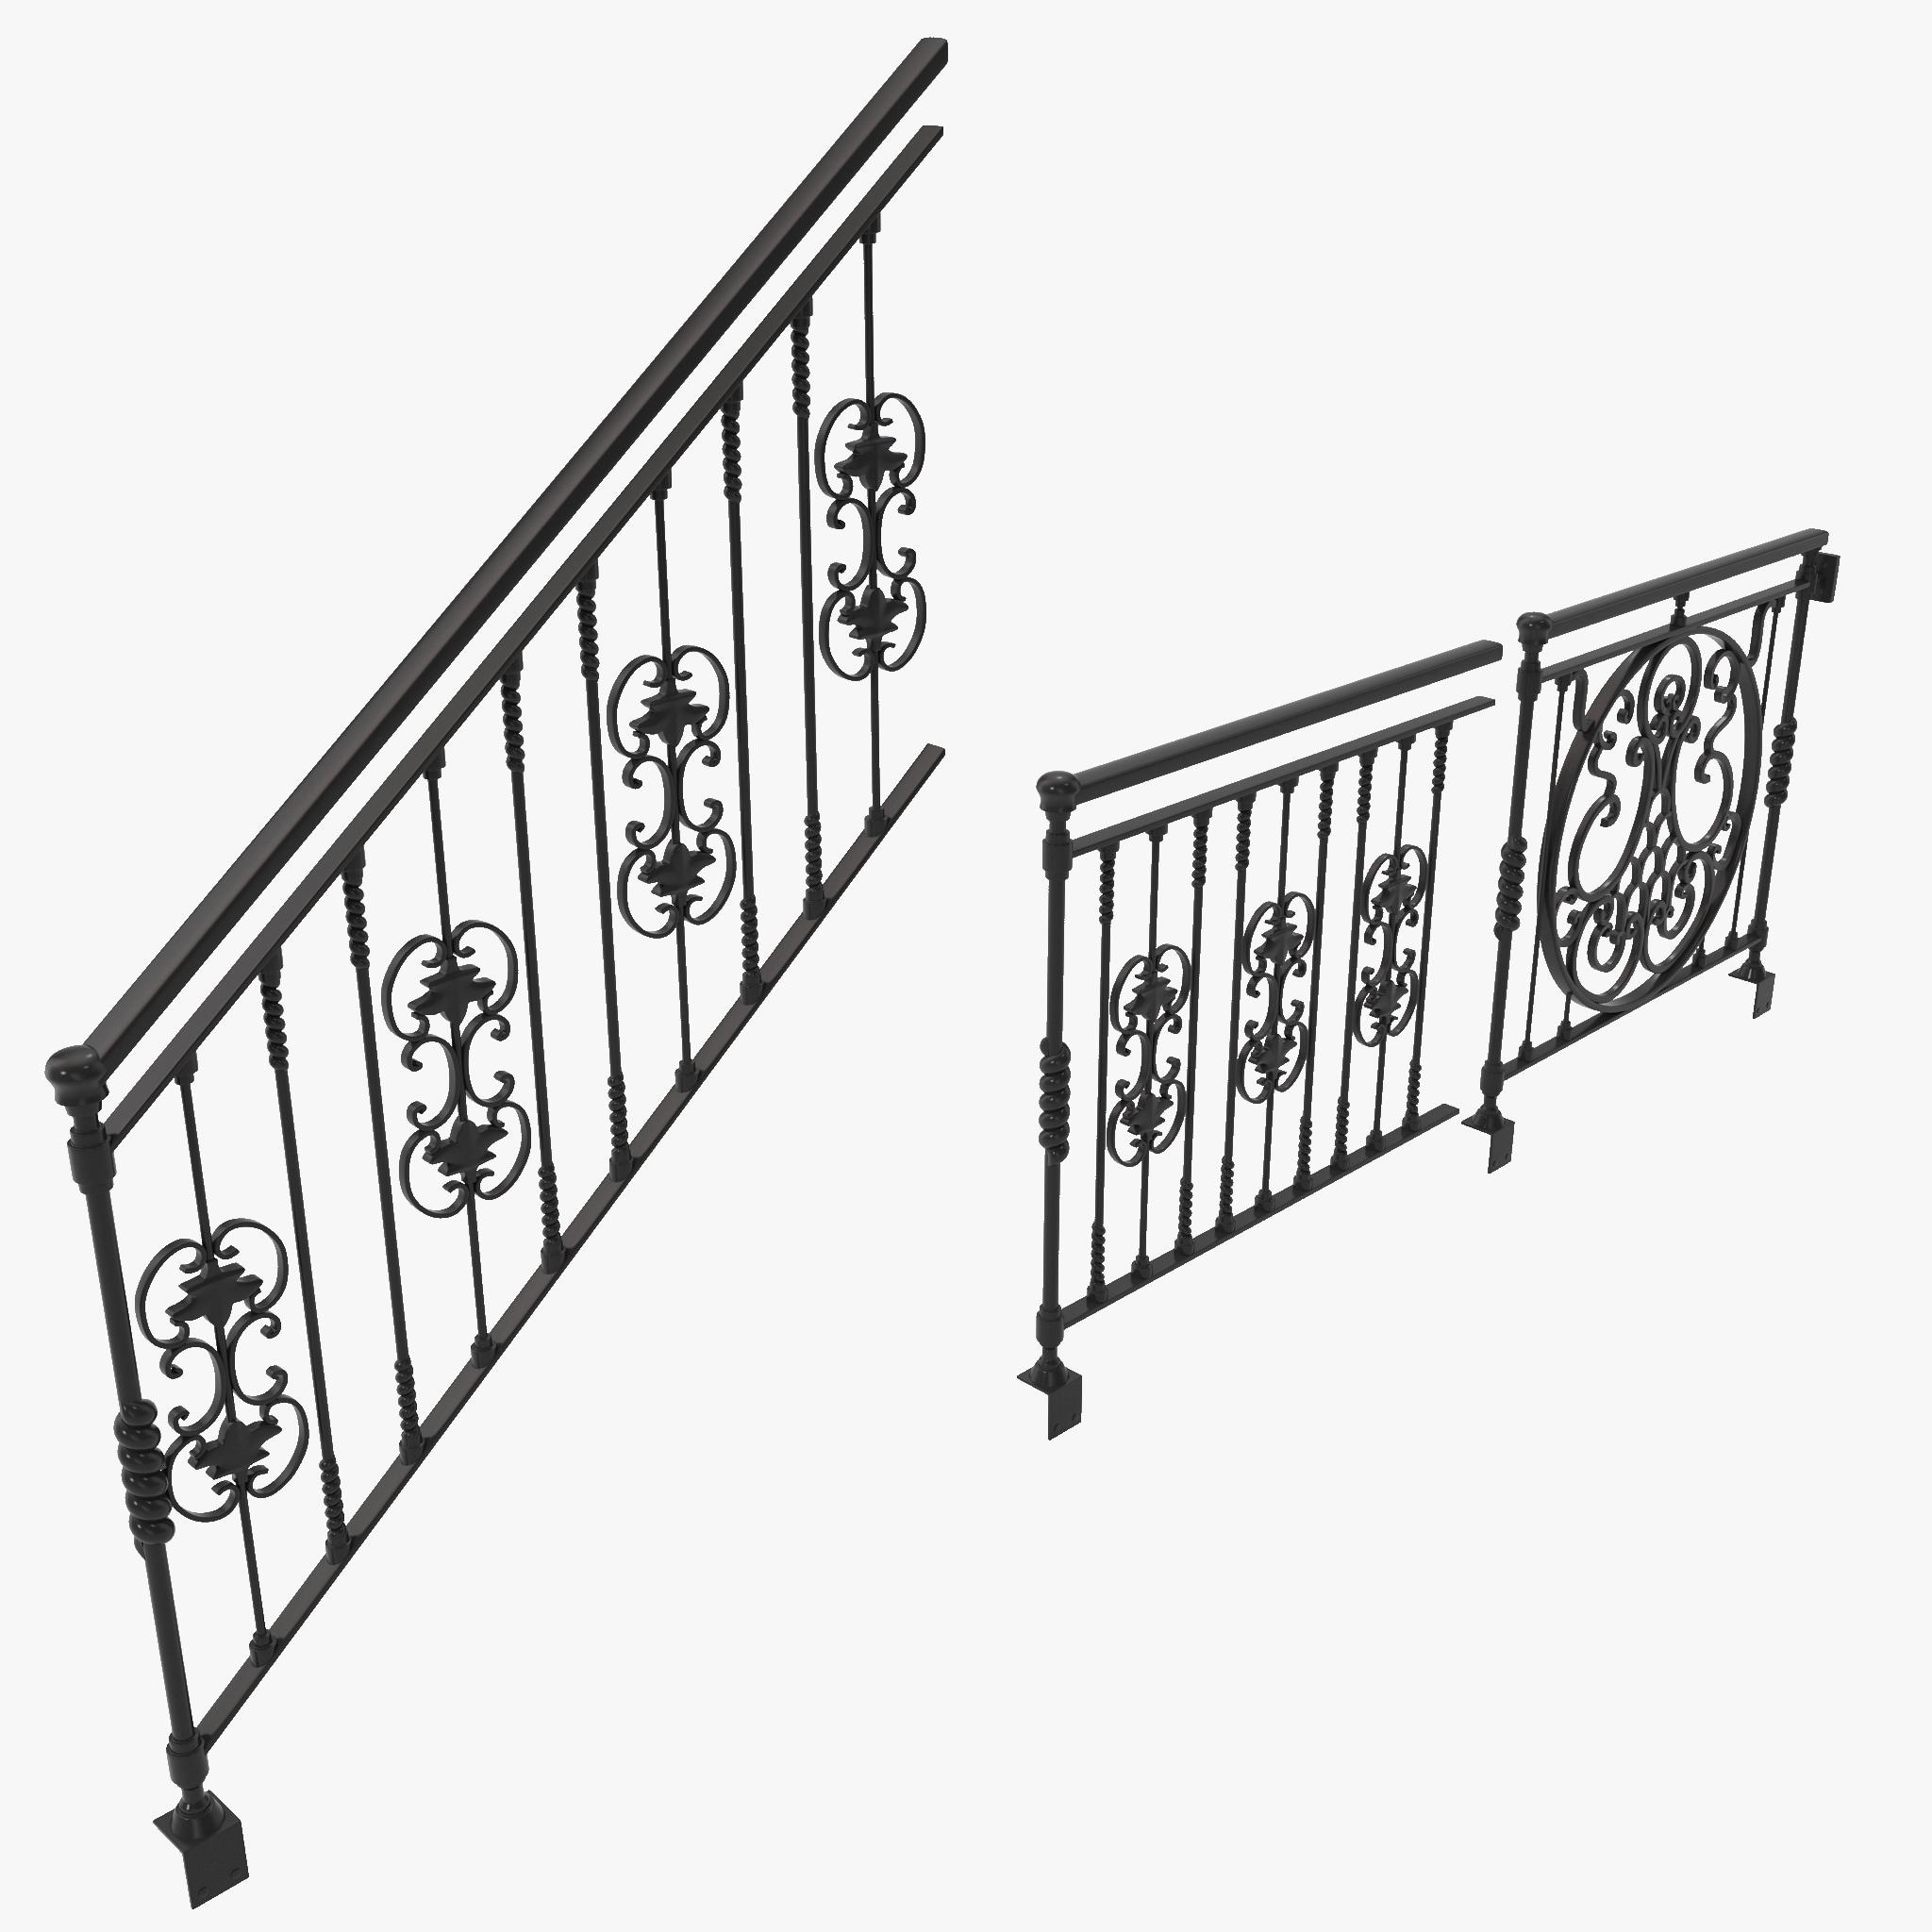 3d ornate railings set design